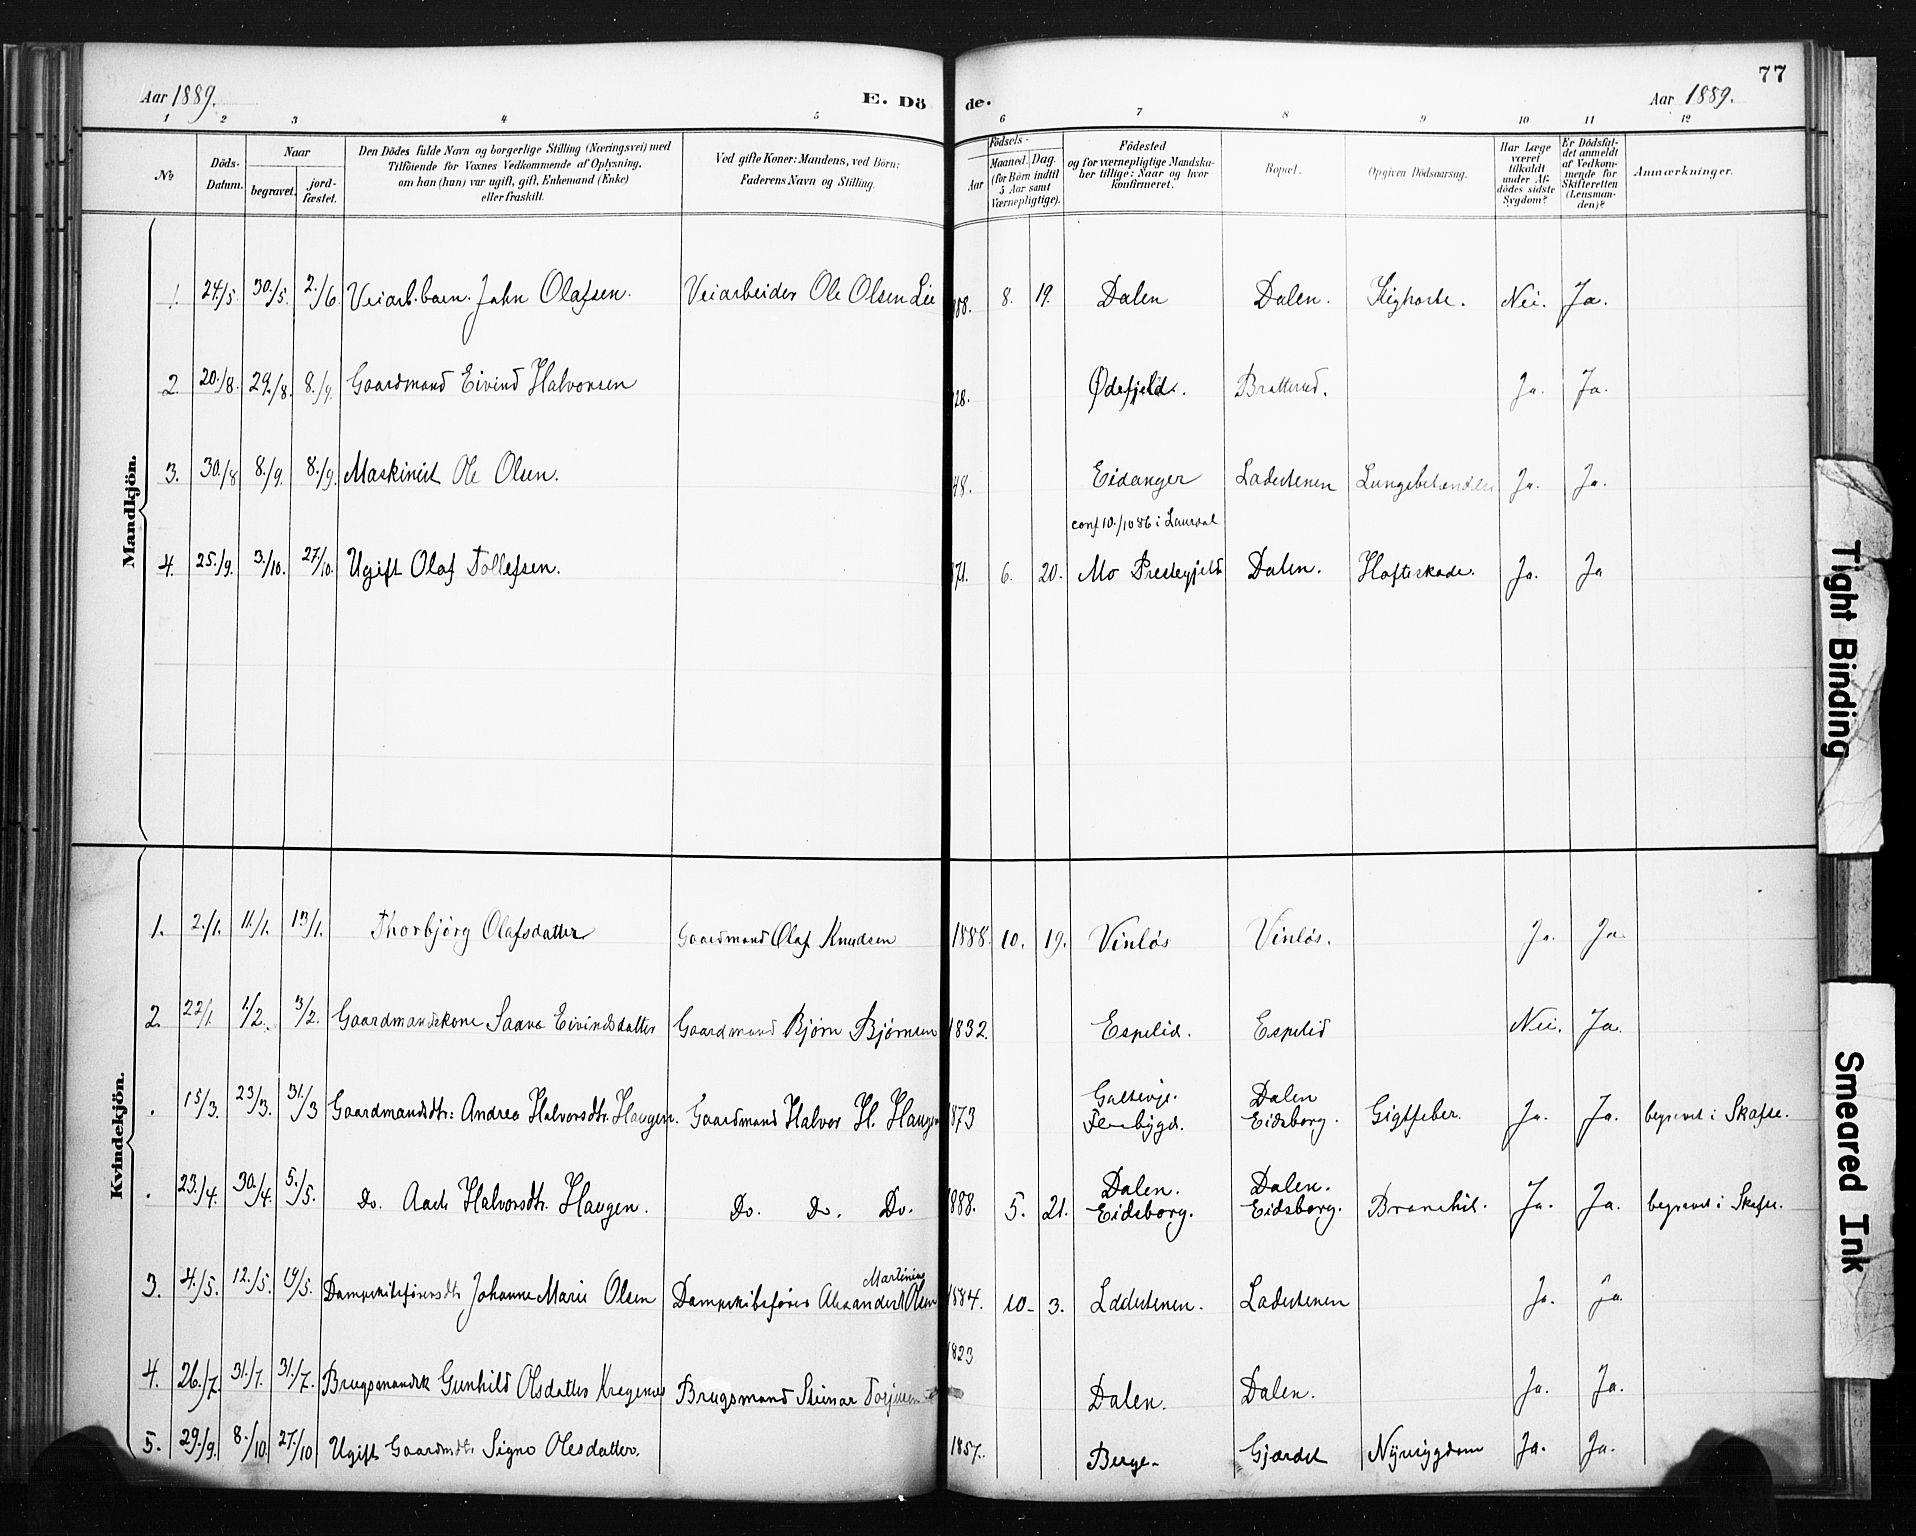 SAKO, Lårdal kirkebøker, F/Fb/L0002: Ministerialbok nr. II 2, 1887-1918, s. 77